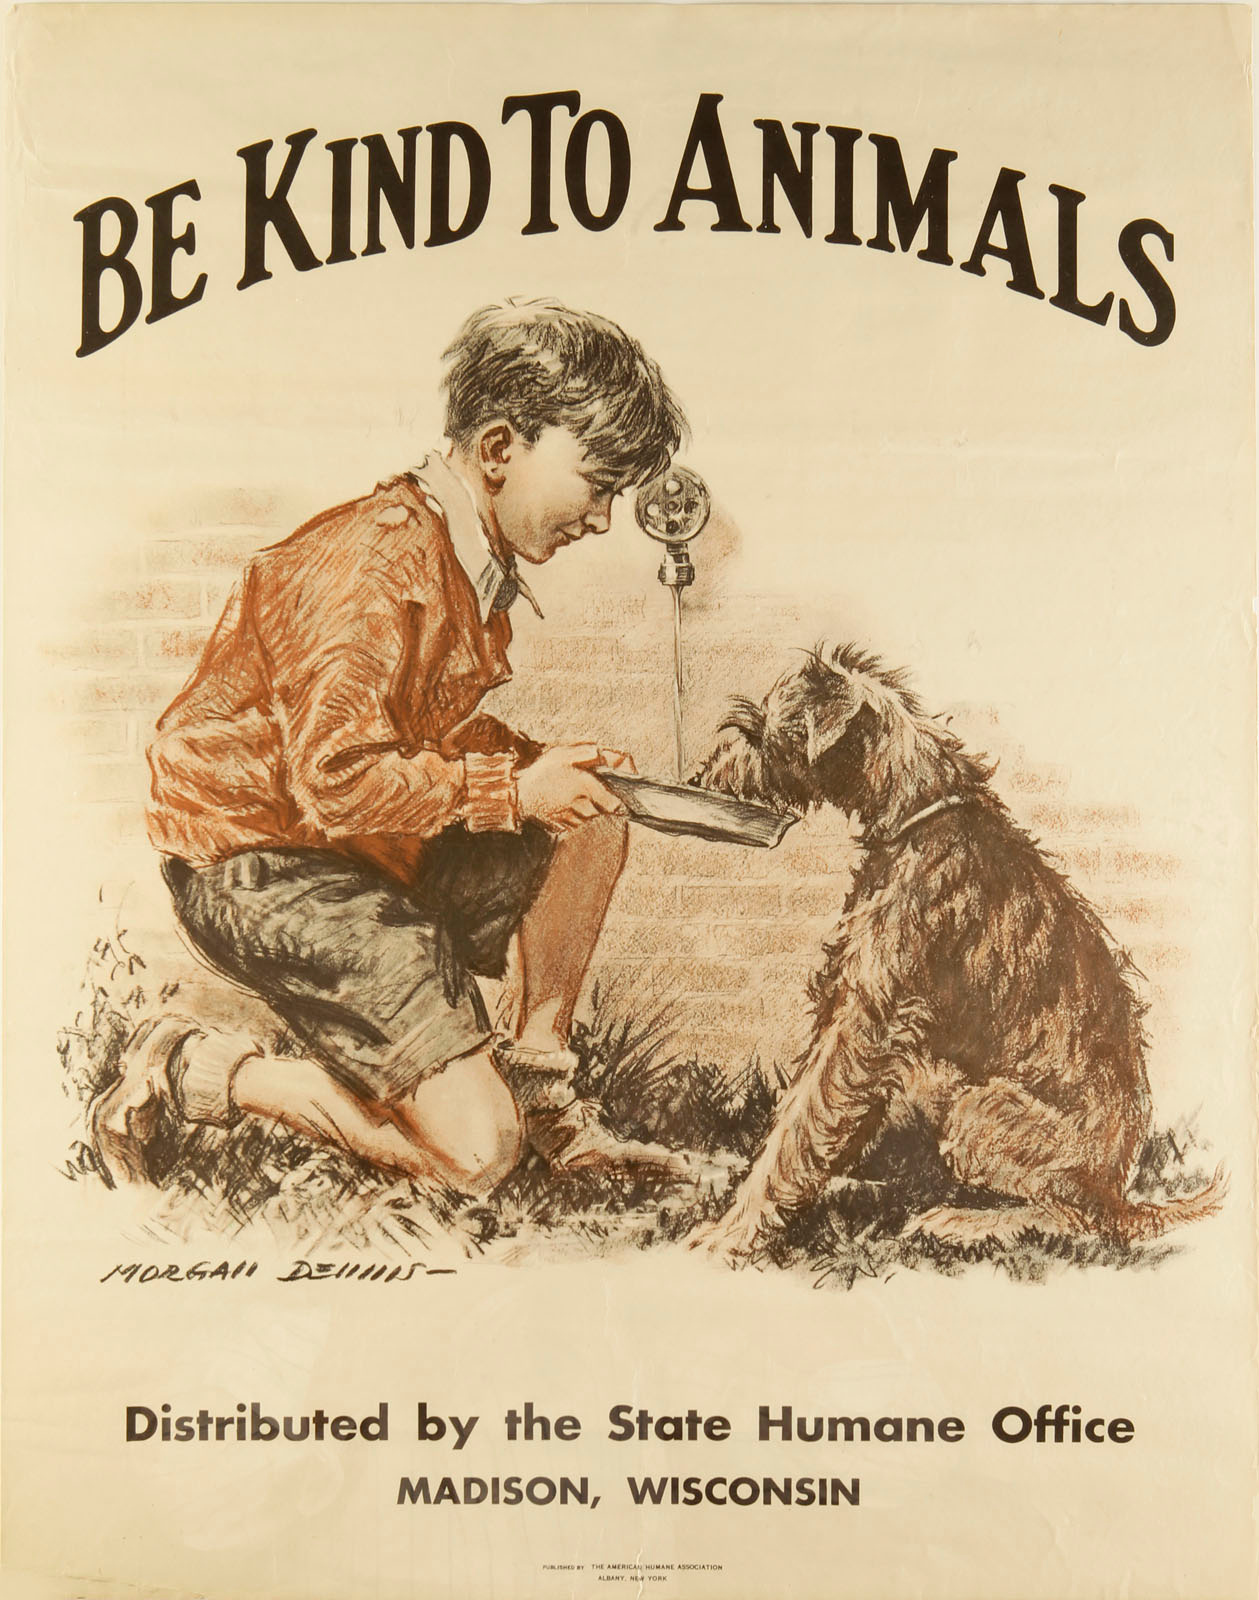 Morgan Dennis Be Kind A Visual History Of Humane Education